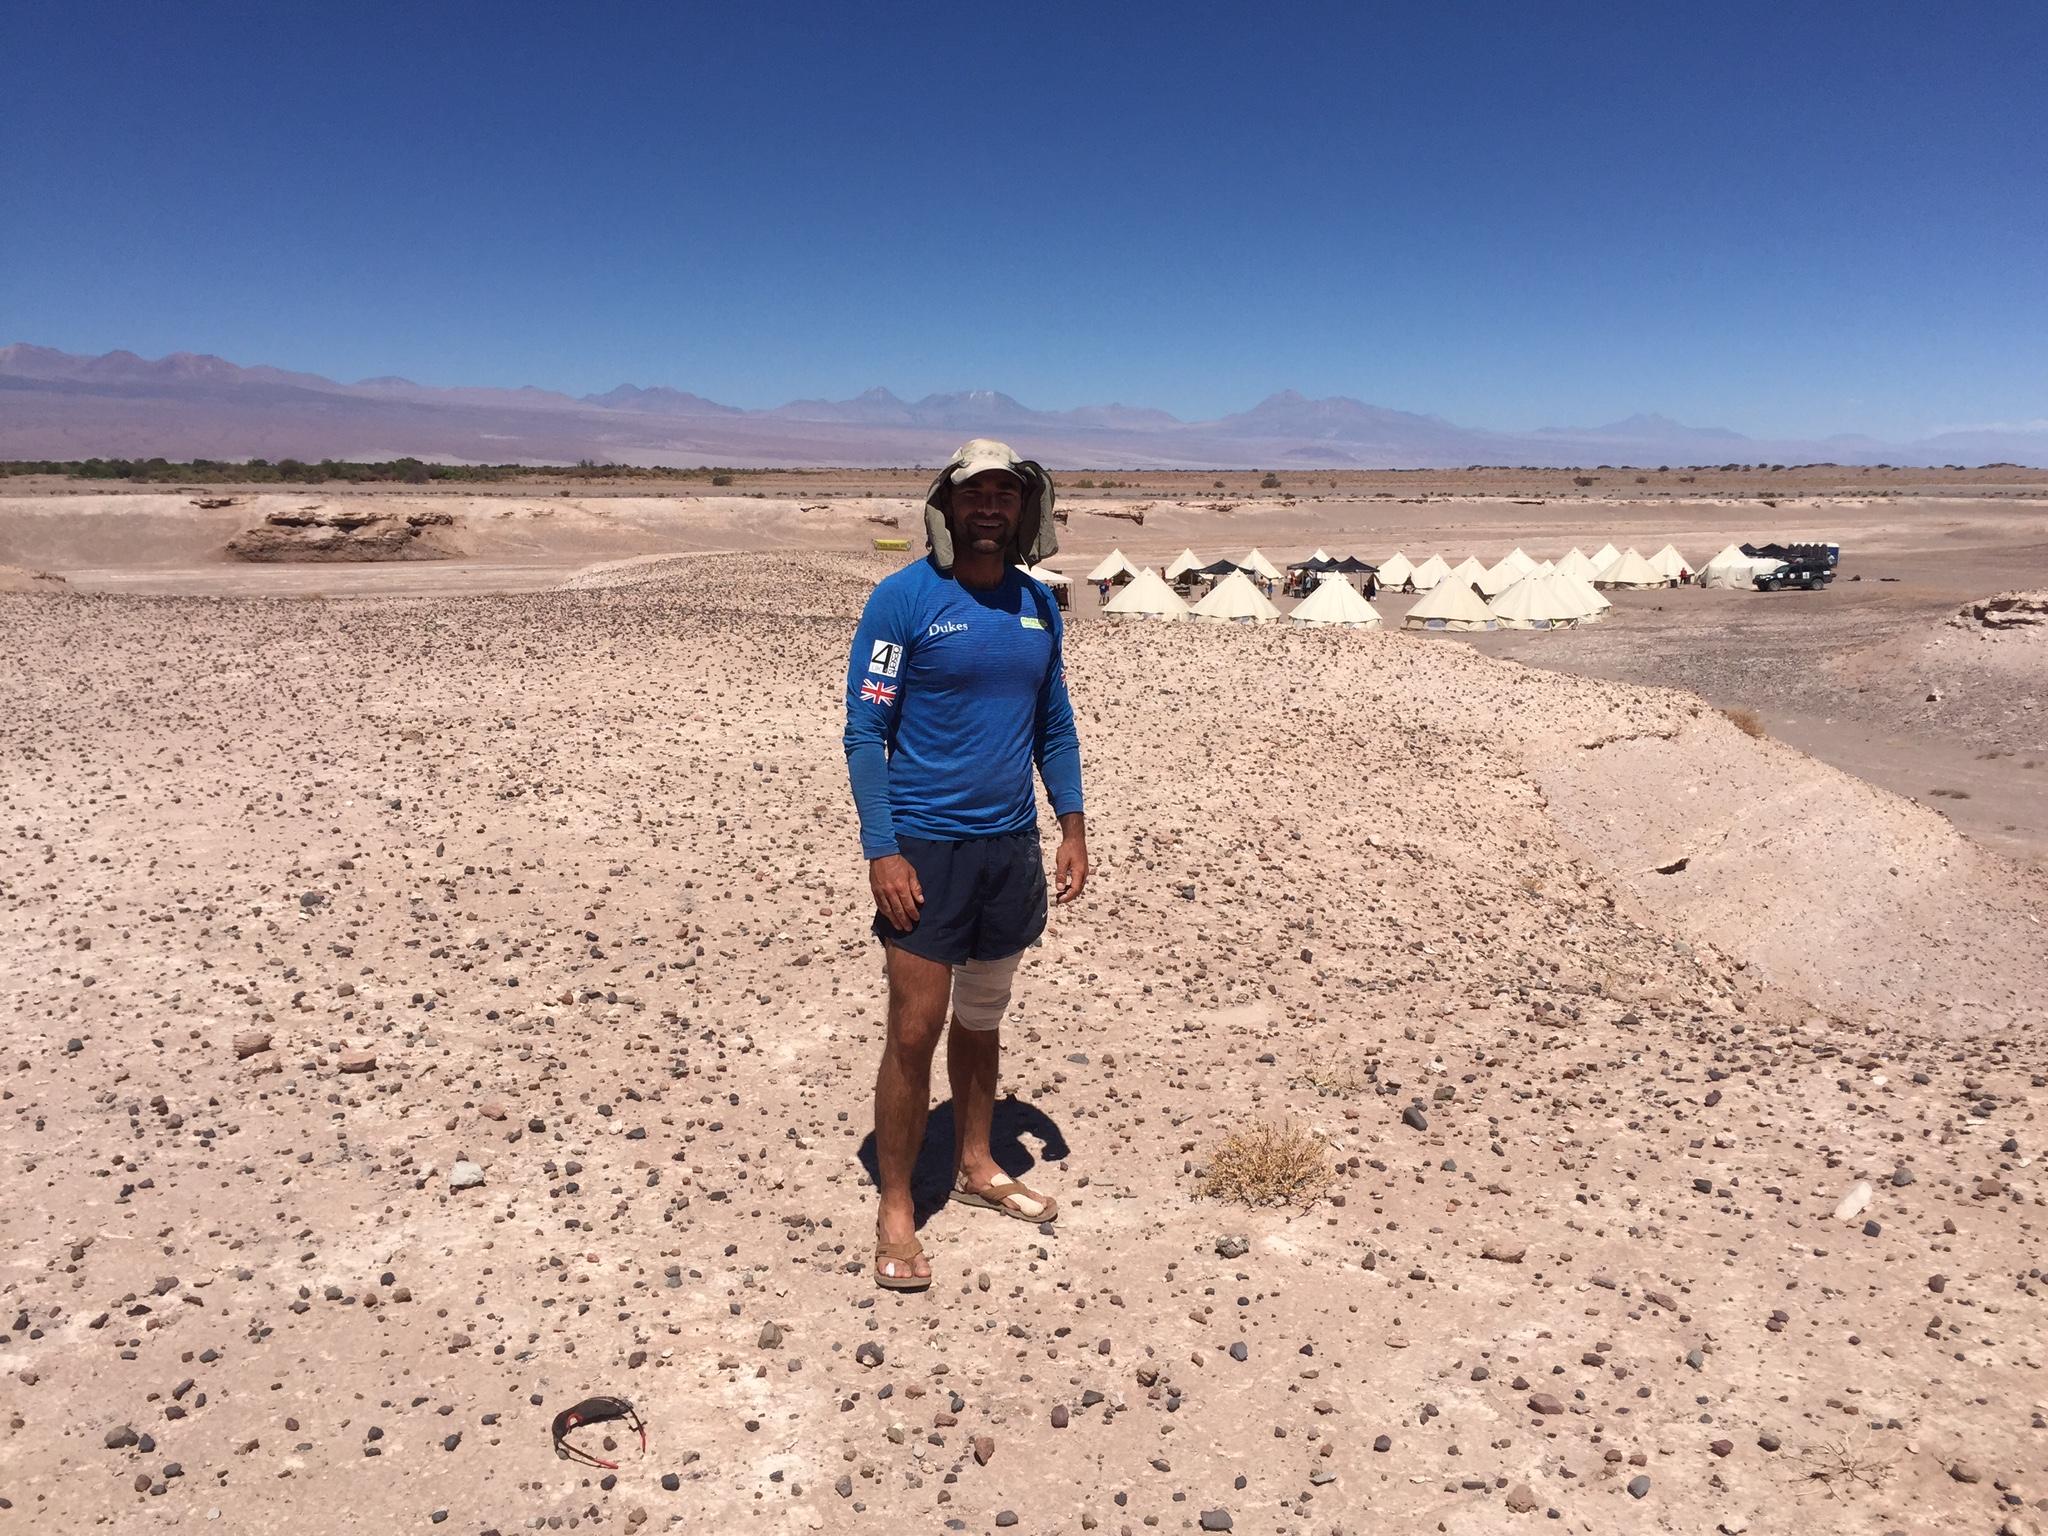 Atacama Desert Expedition. 6 marathons in 5 days, Part of the @4Deserts Expedition.